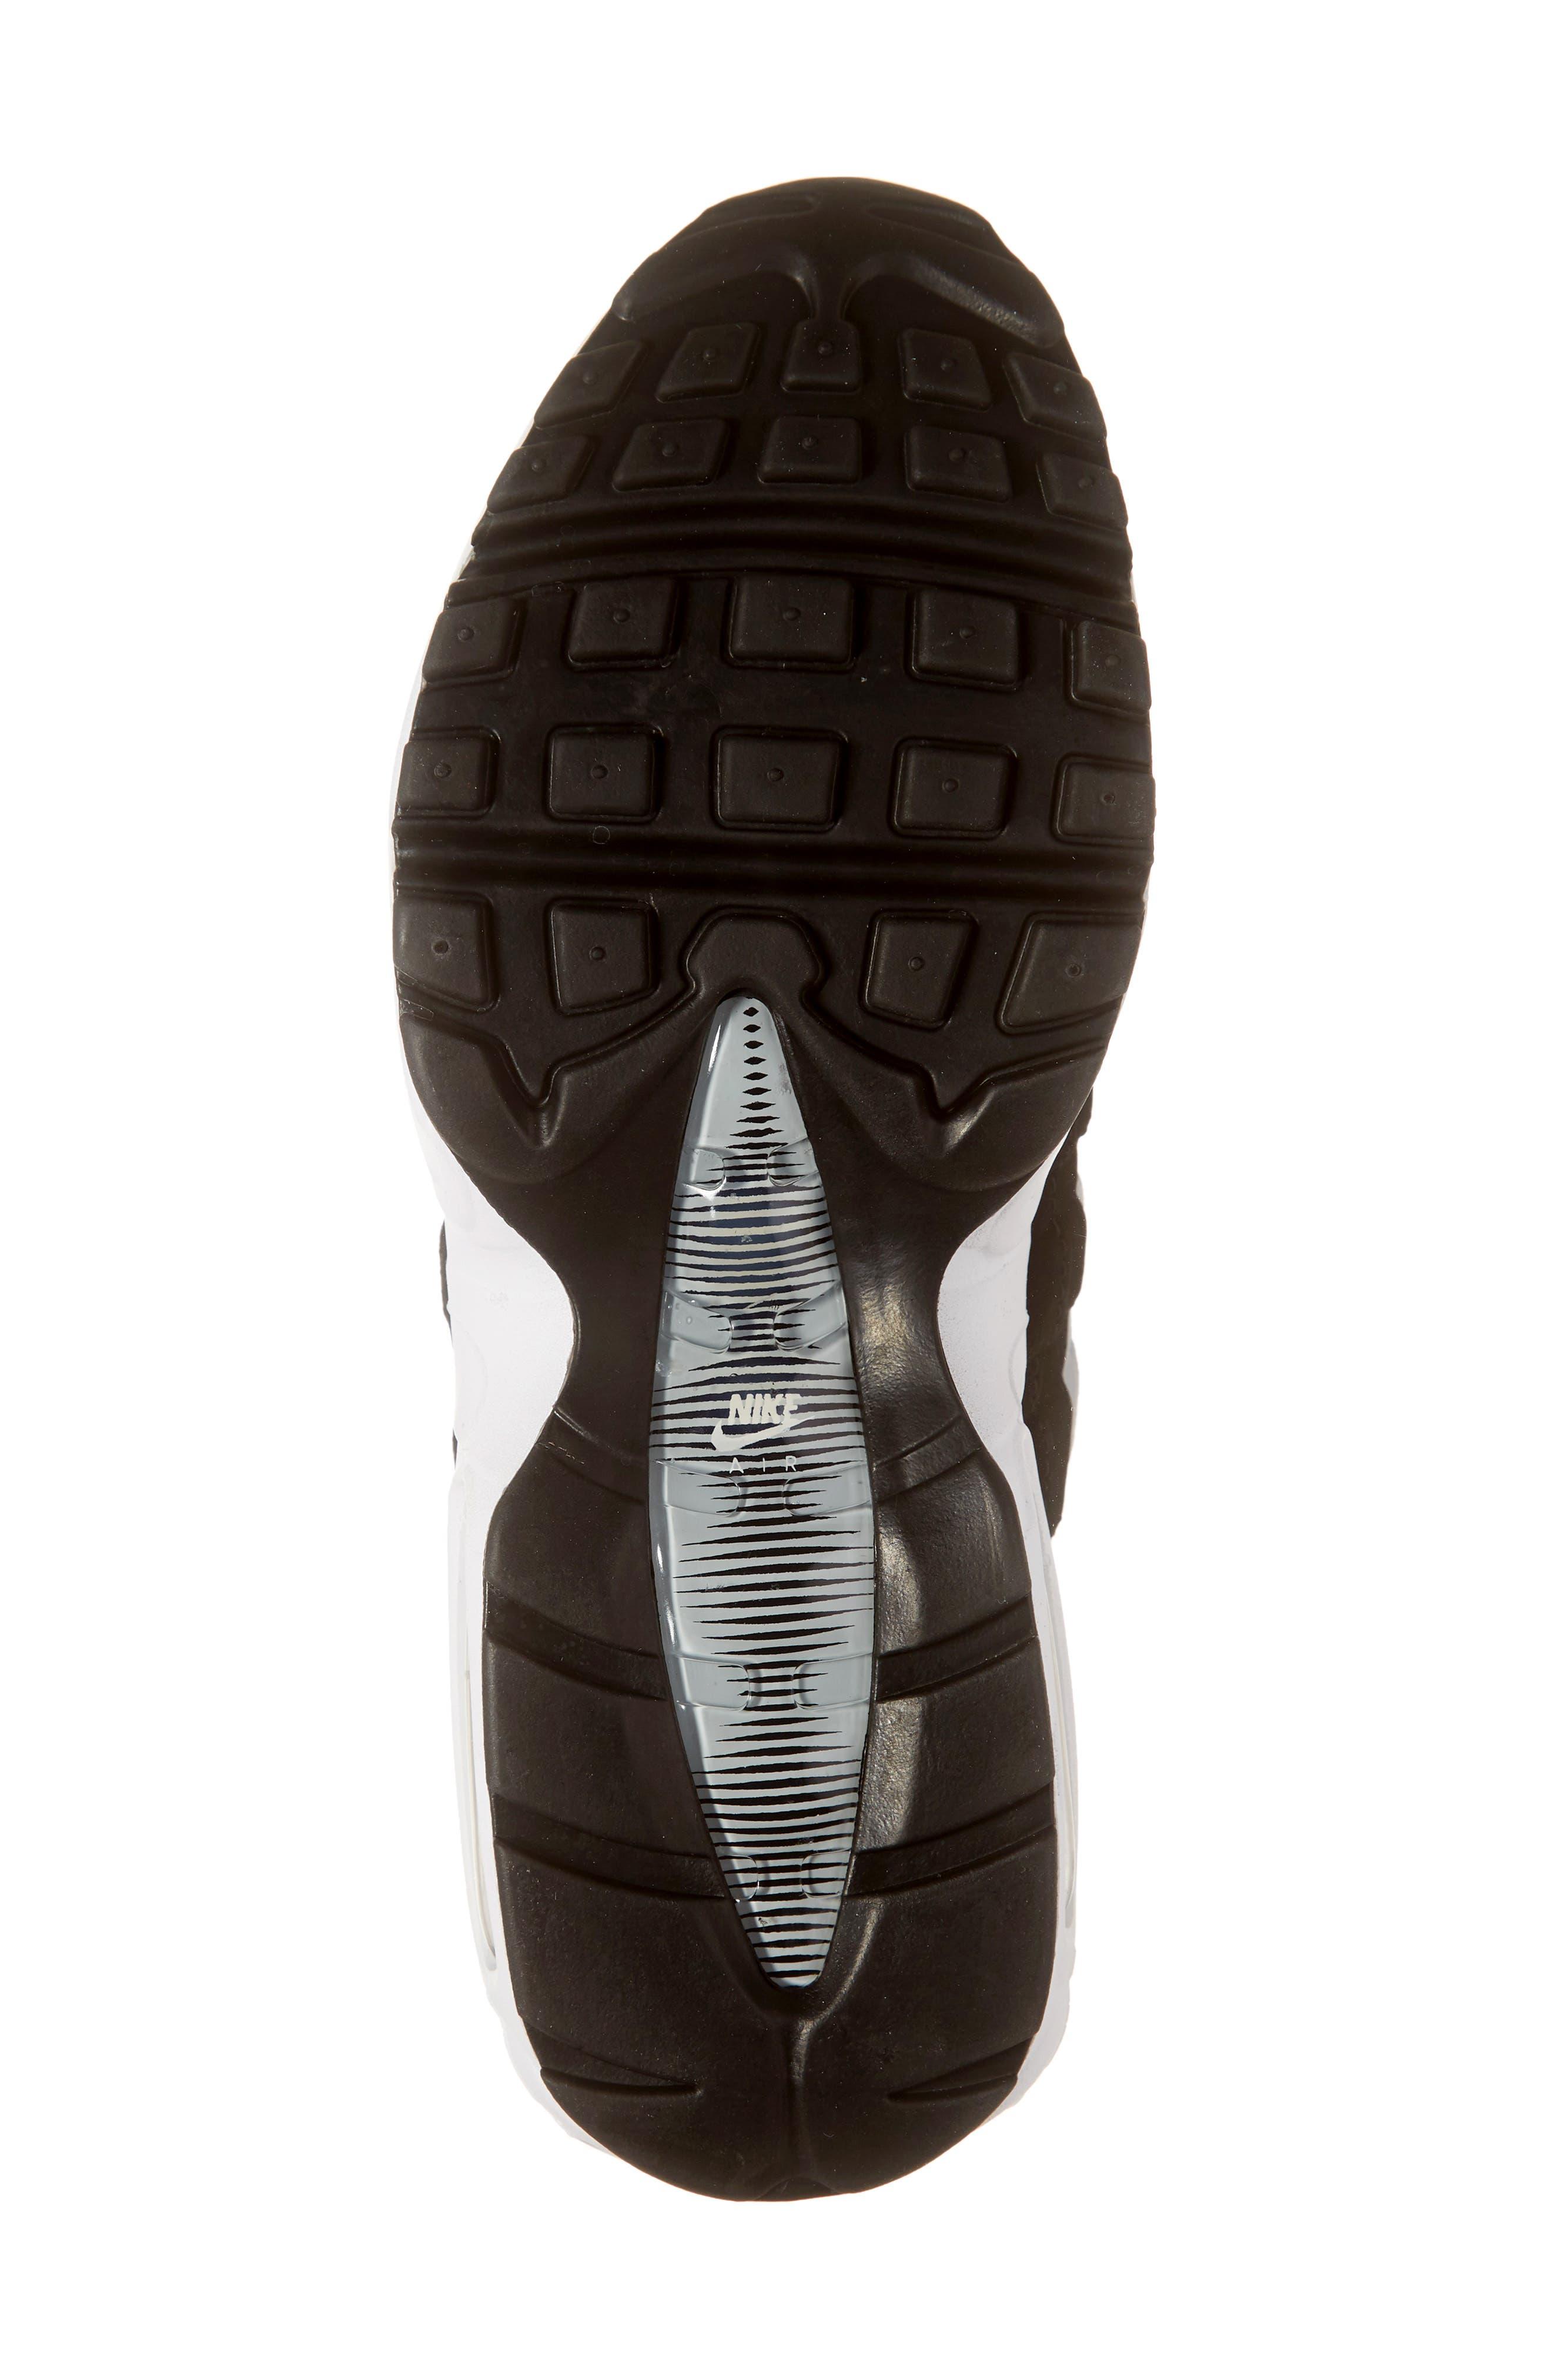 NIKE,                             'Air Max 95 Essential' Sneaker,                             Alternate thumbnail 6, color,                             BLACK/ WHITE/ WOLF GREY